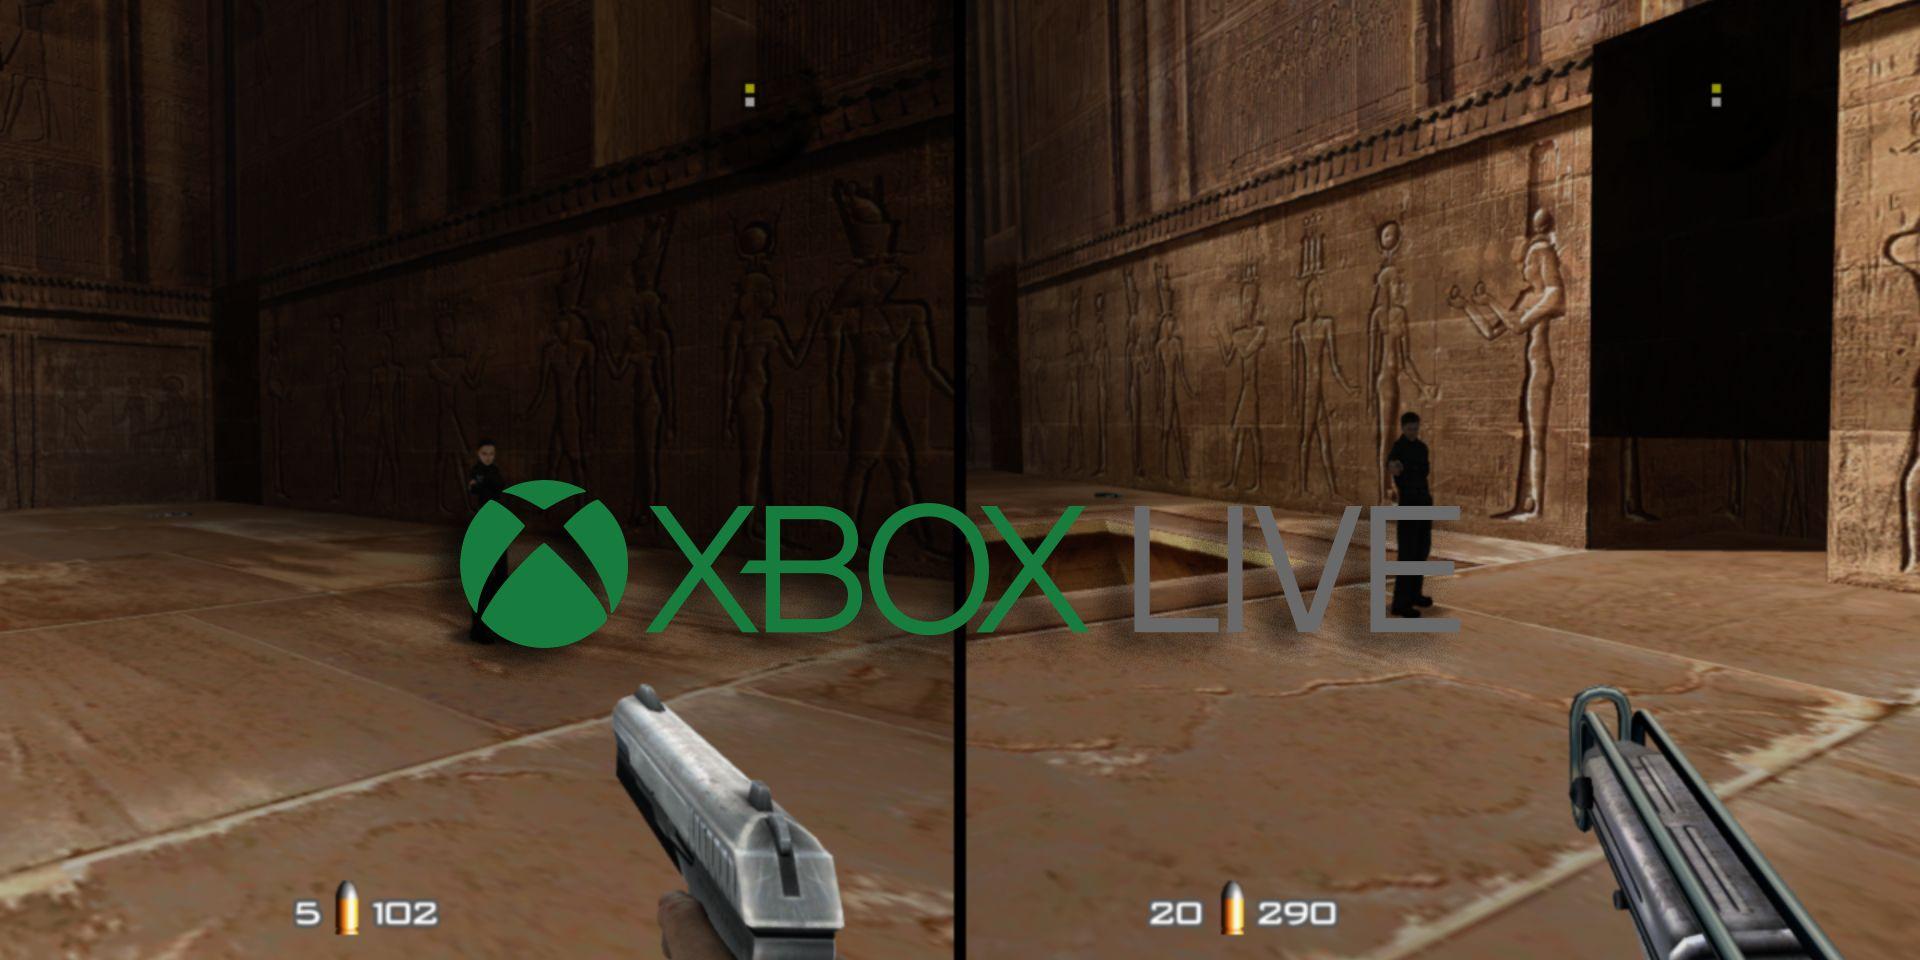 Goldeneye Xbla Remaster Was Planned To Have Online Multiplayer